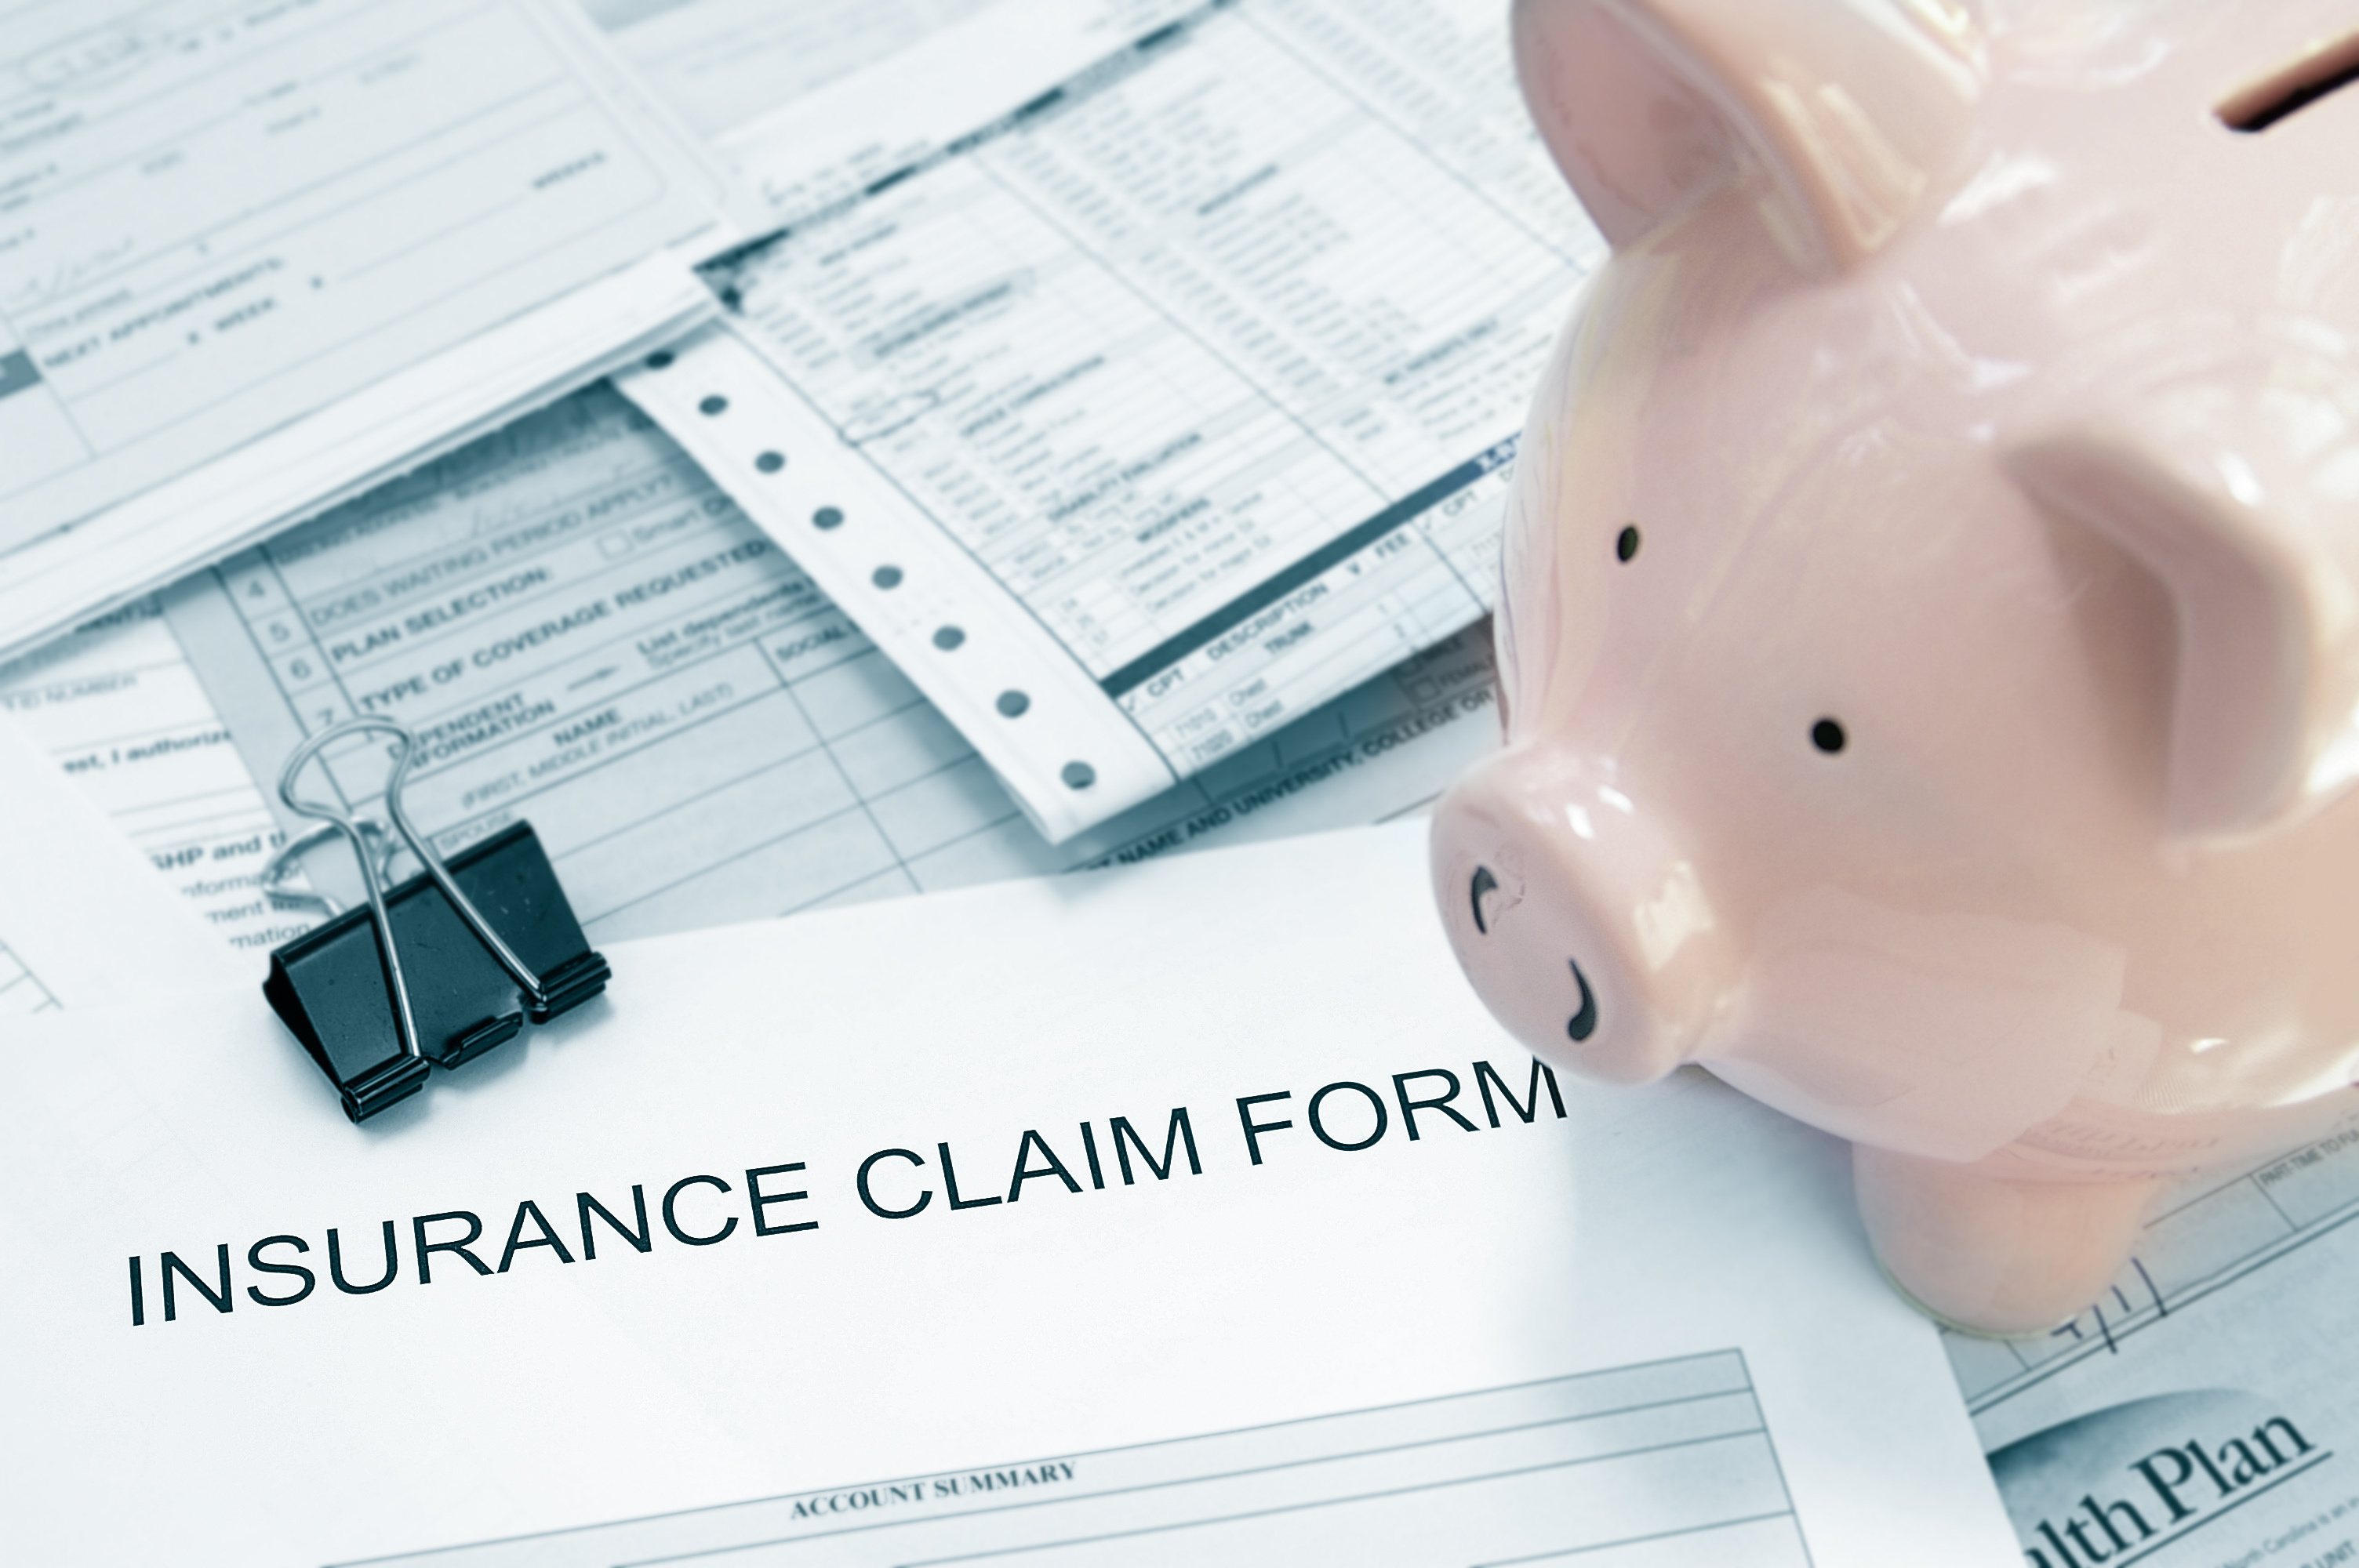 Regulatory Compliance - Understanding the HIPAA Omnibus Rule